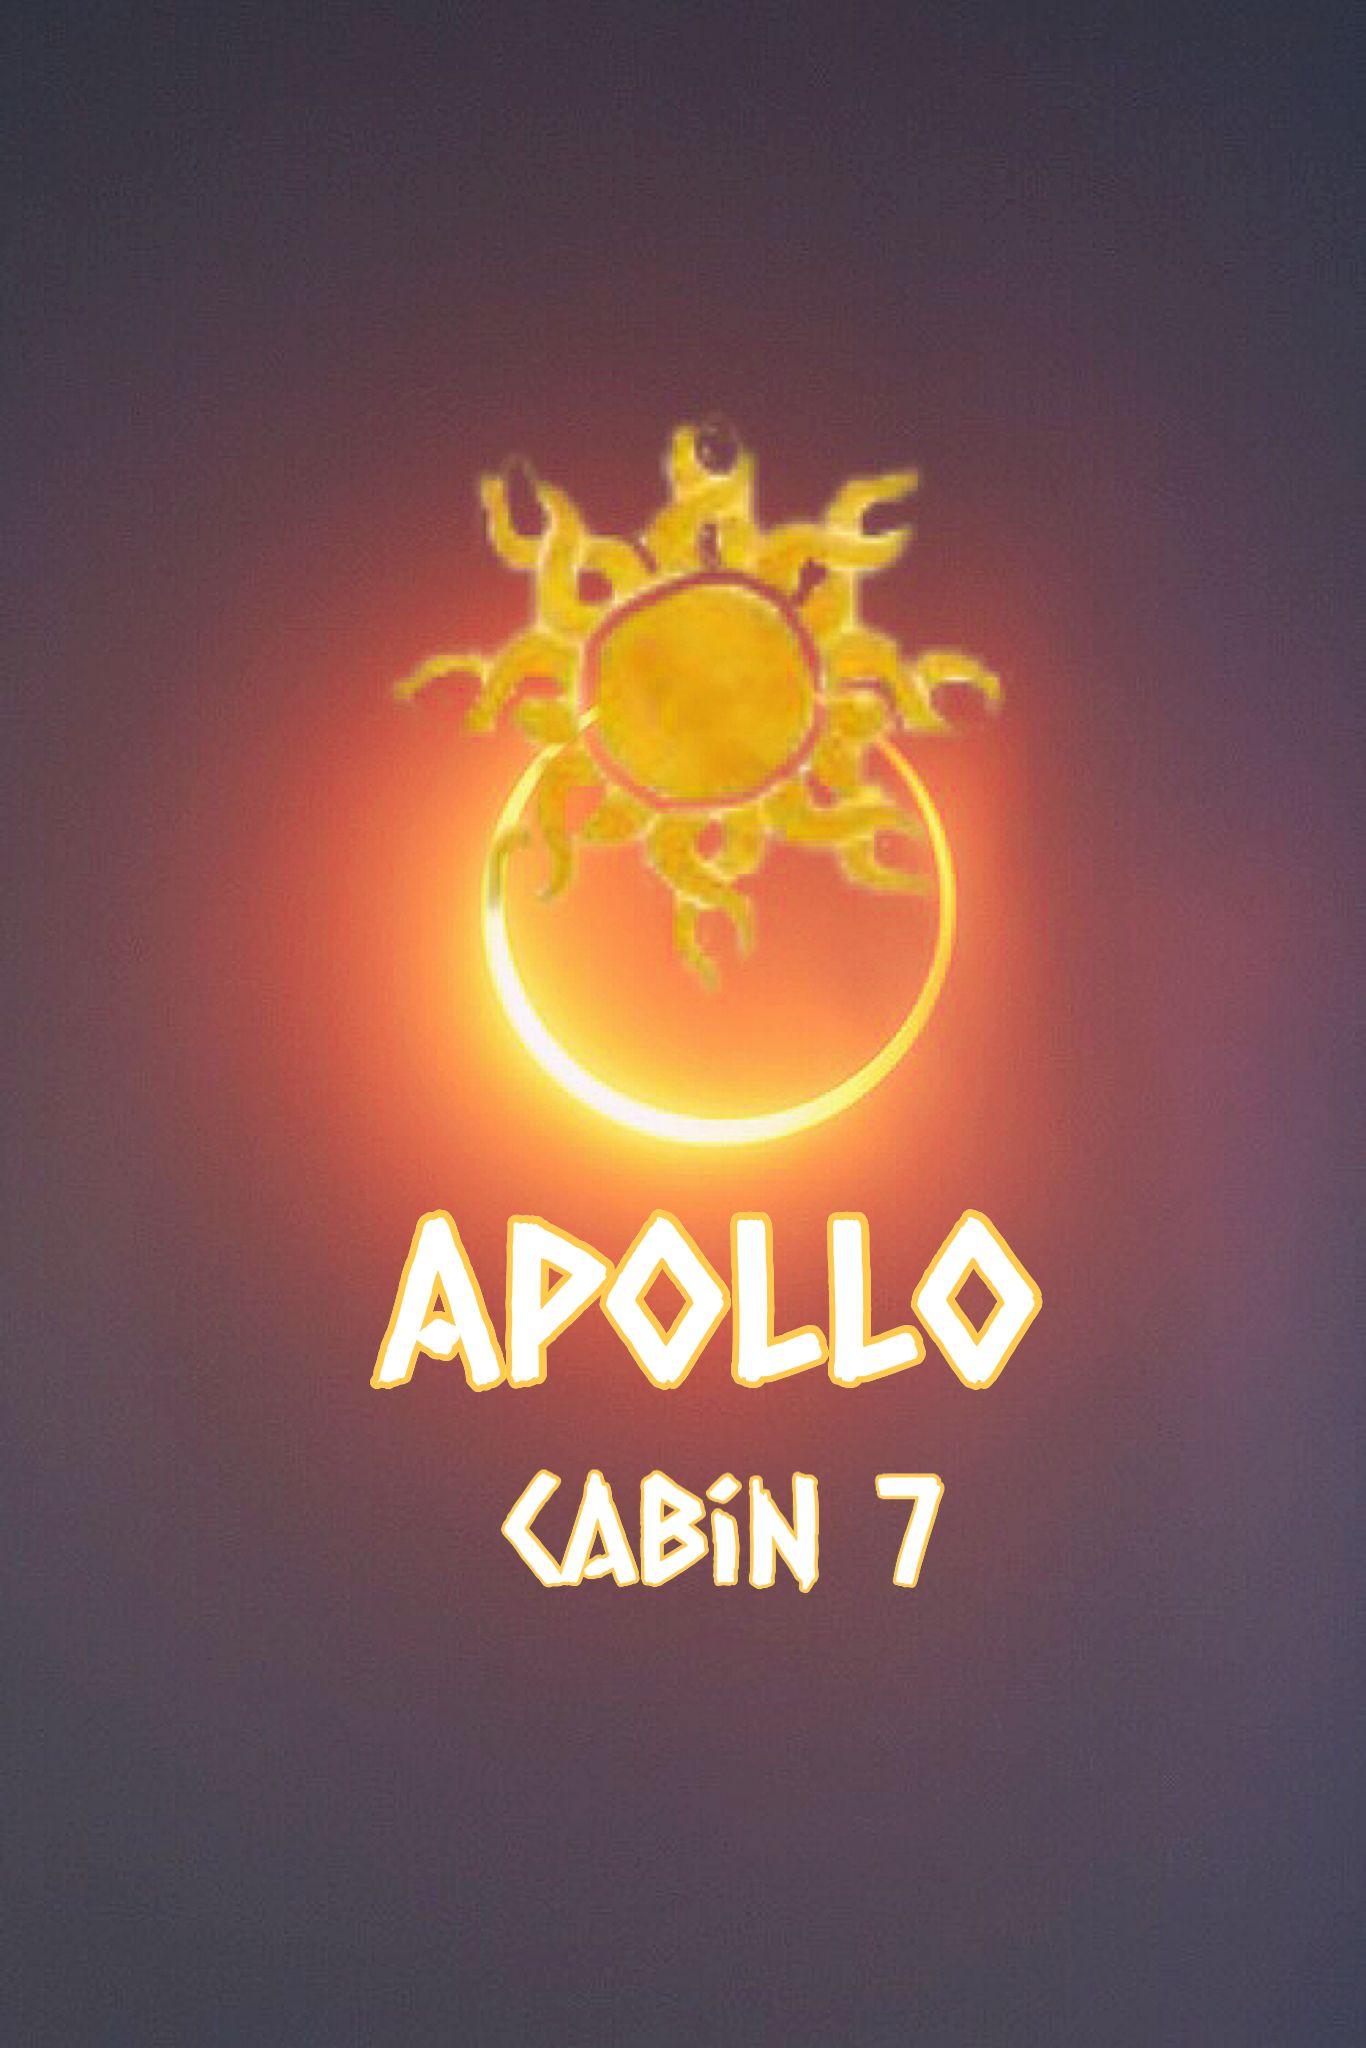 Apollo Cabin Percy Jackson Wallpaper